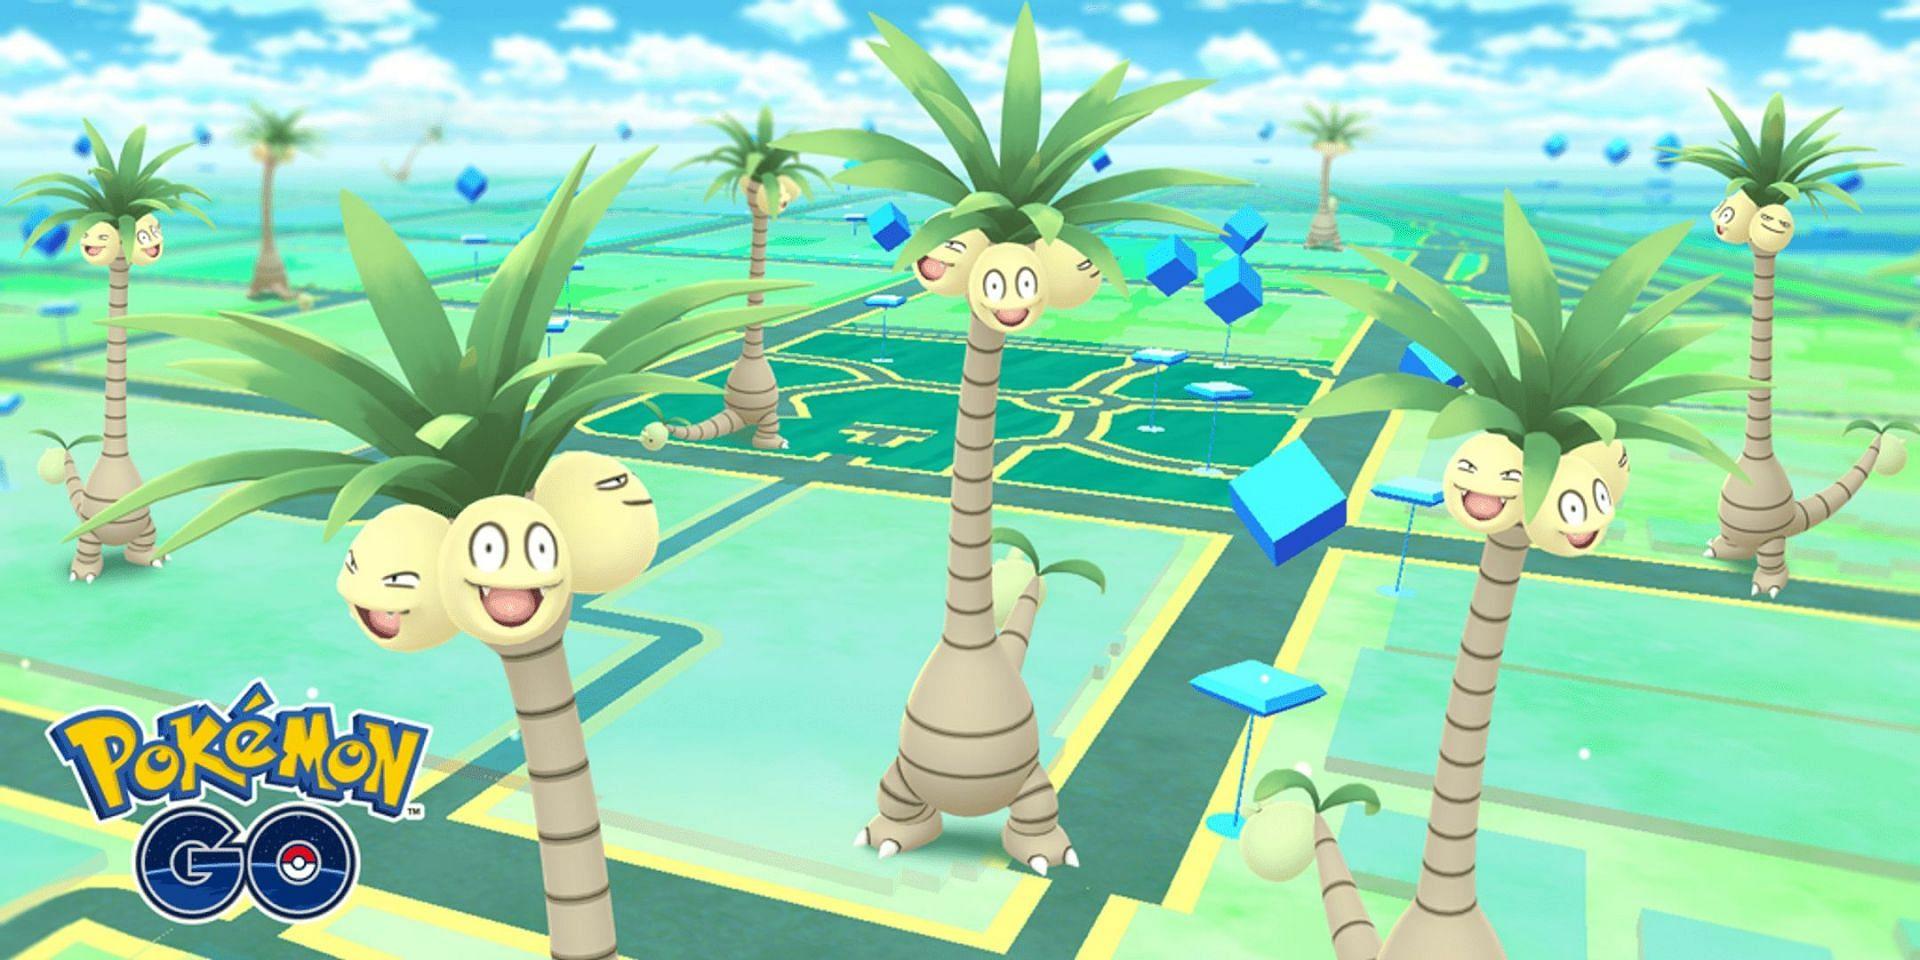 Alolan Exeggutor as it appears on the map in Pokemon GO (Image via Niantic)